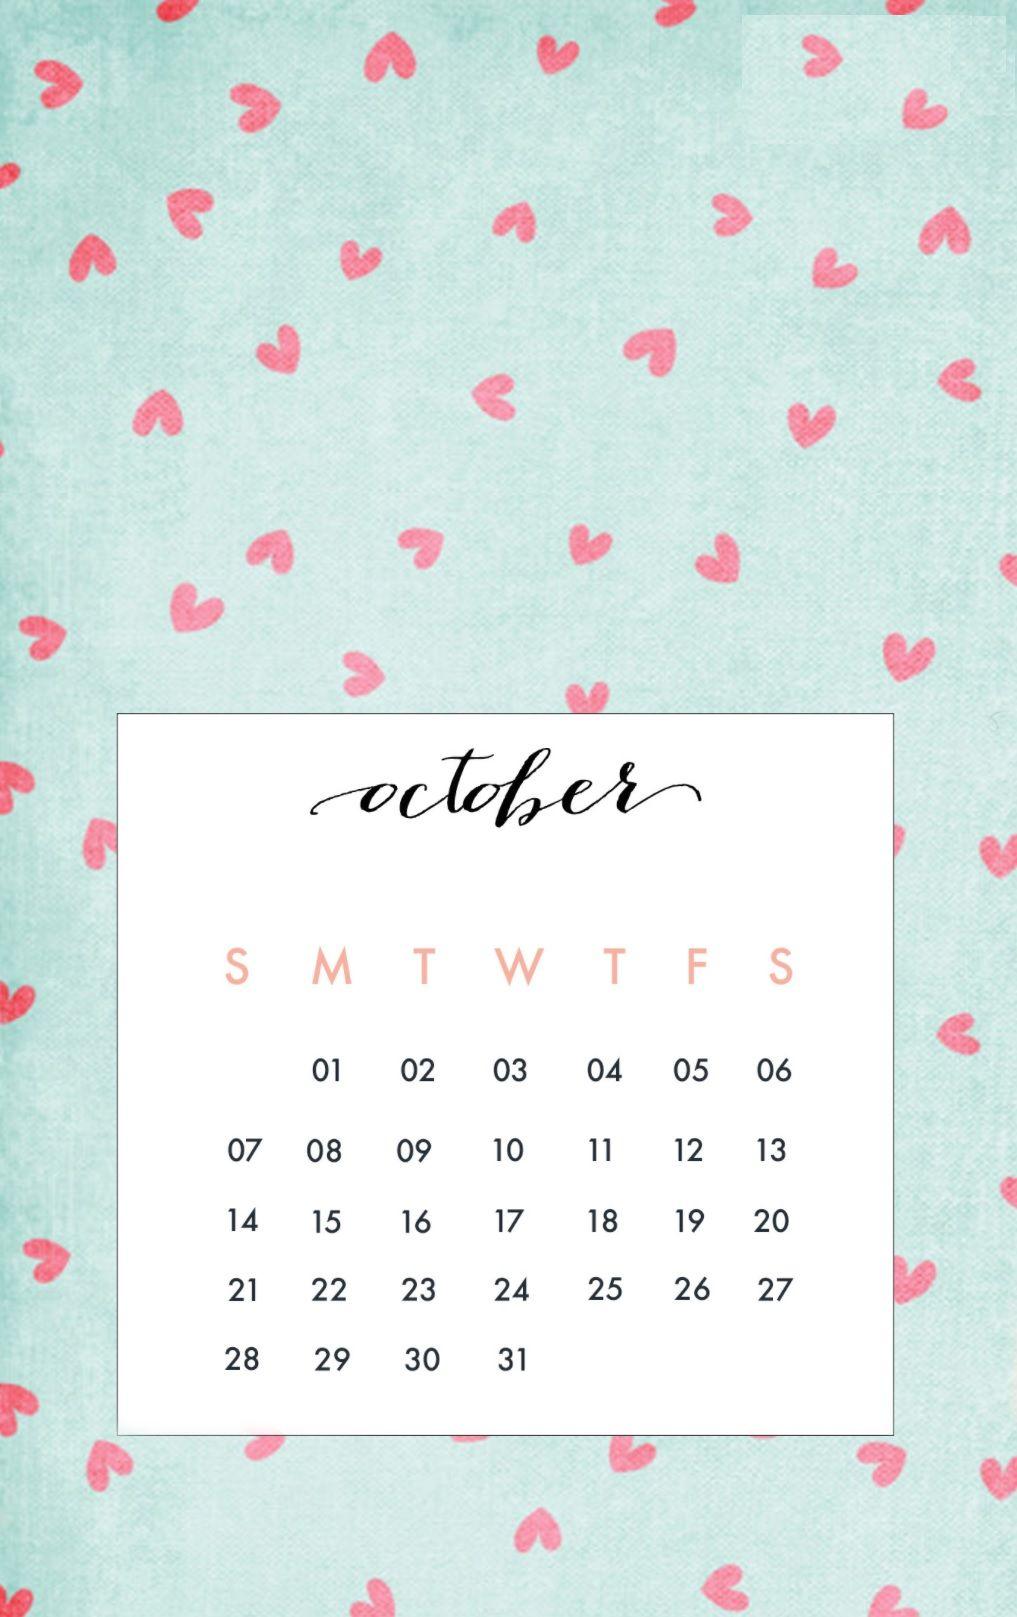 october 2018 iphone calendar wallpapers calendar 2018